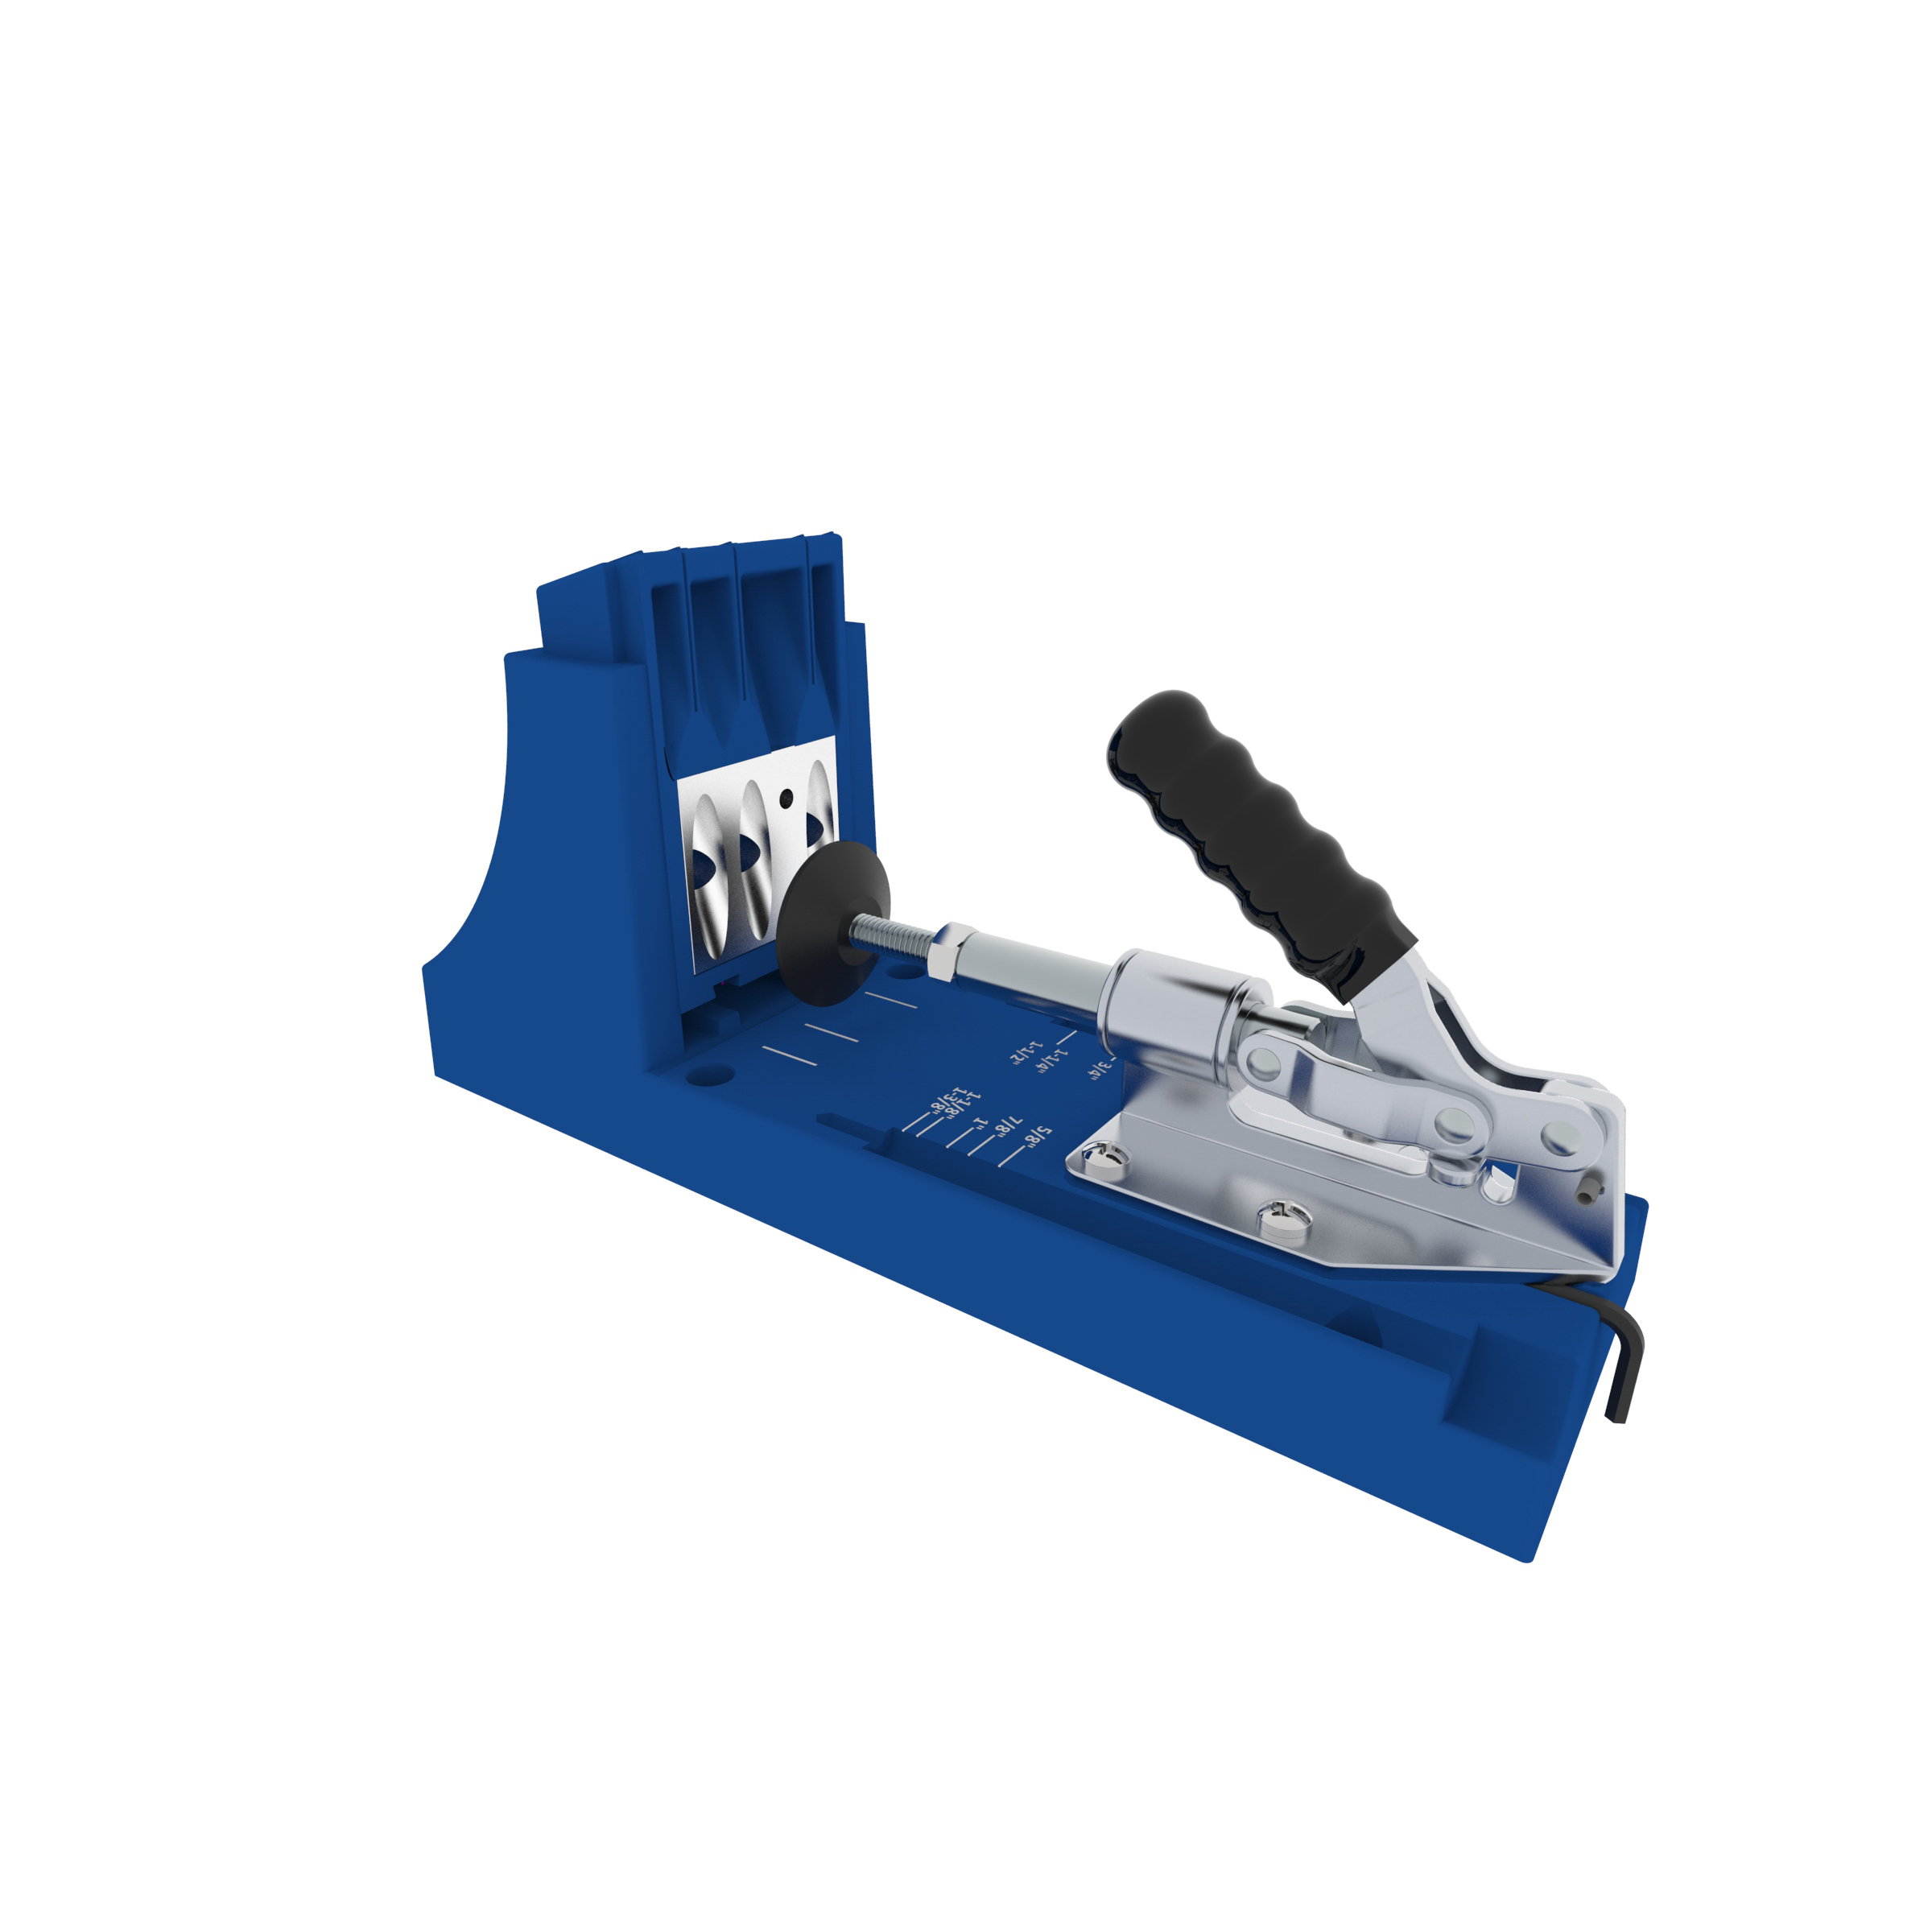 Kreg Pocket-Hole Jig® K4